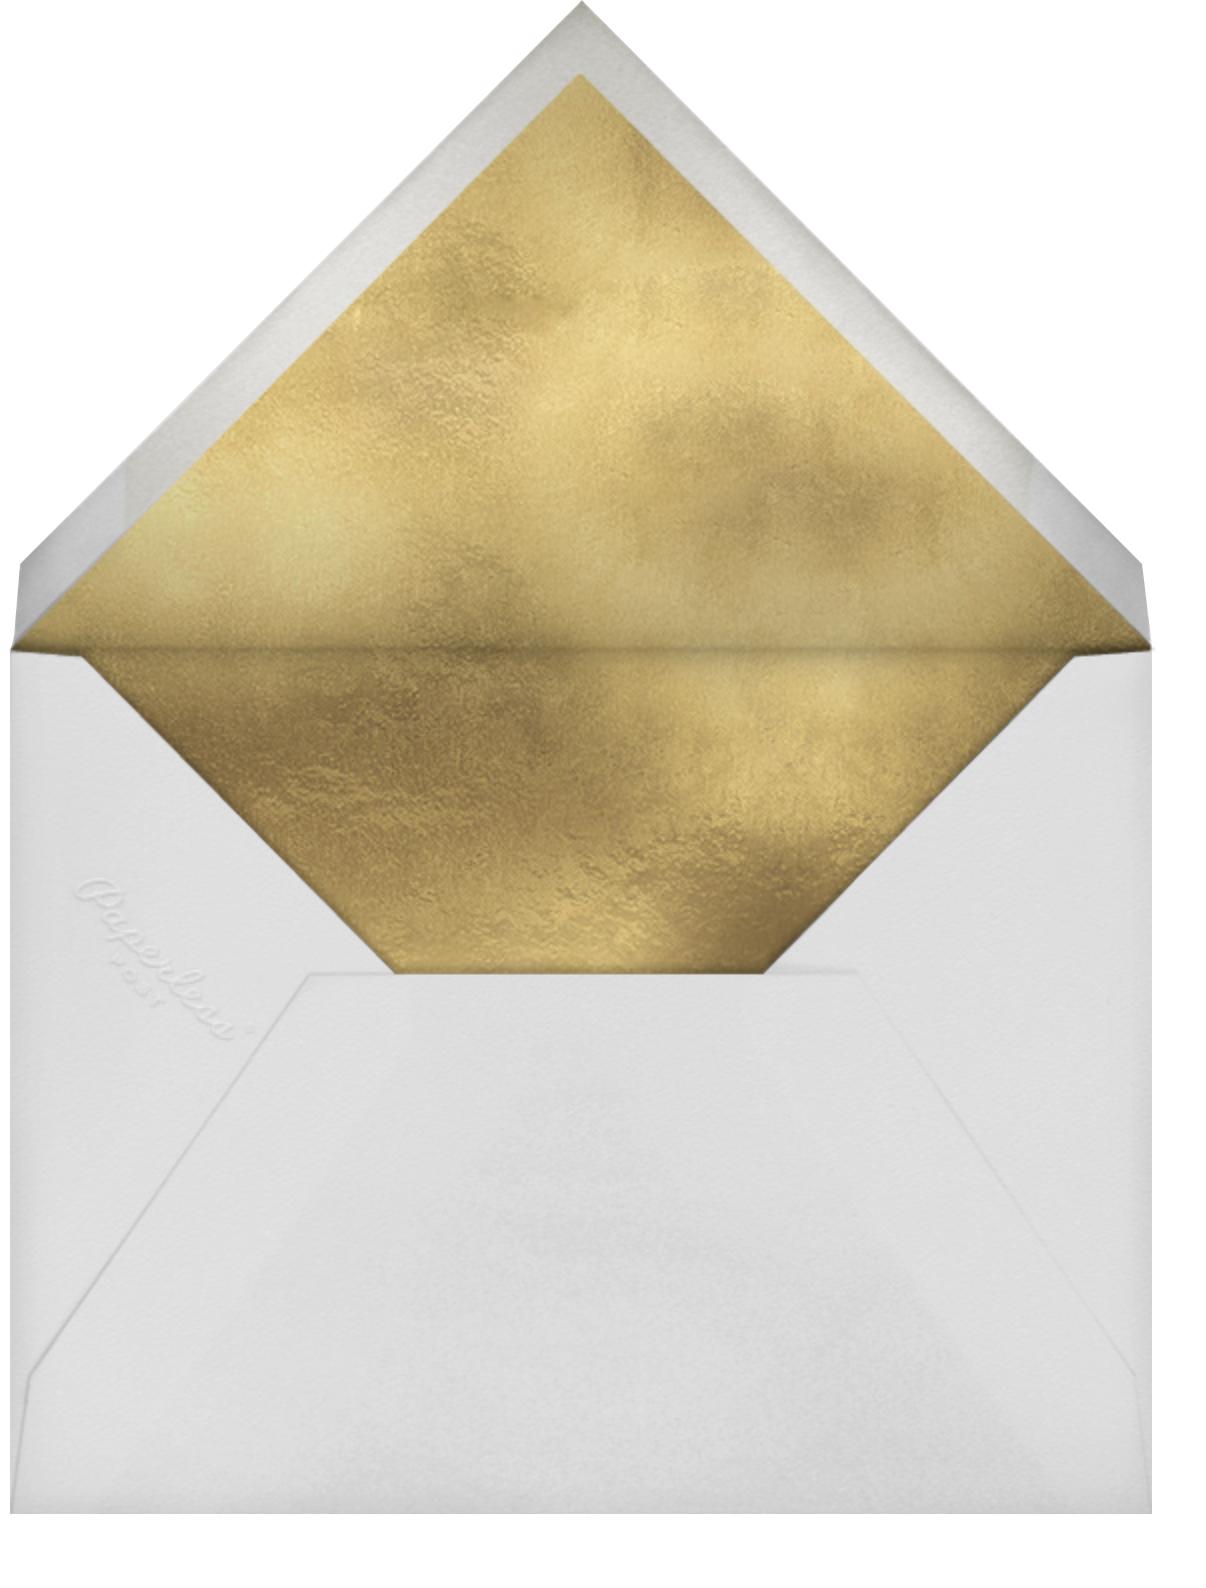 Juliet Rose Thank You - Rifle Paper Co. - Envelope